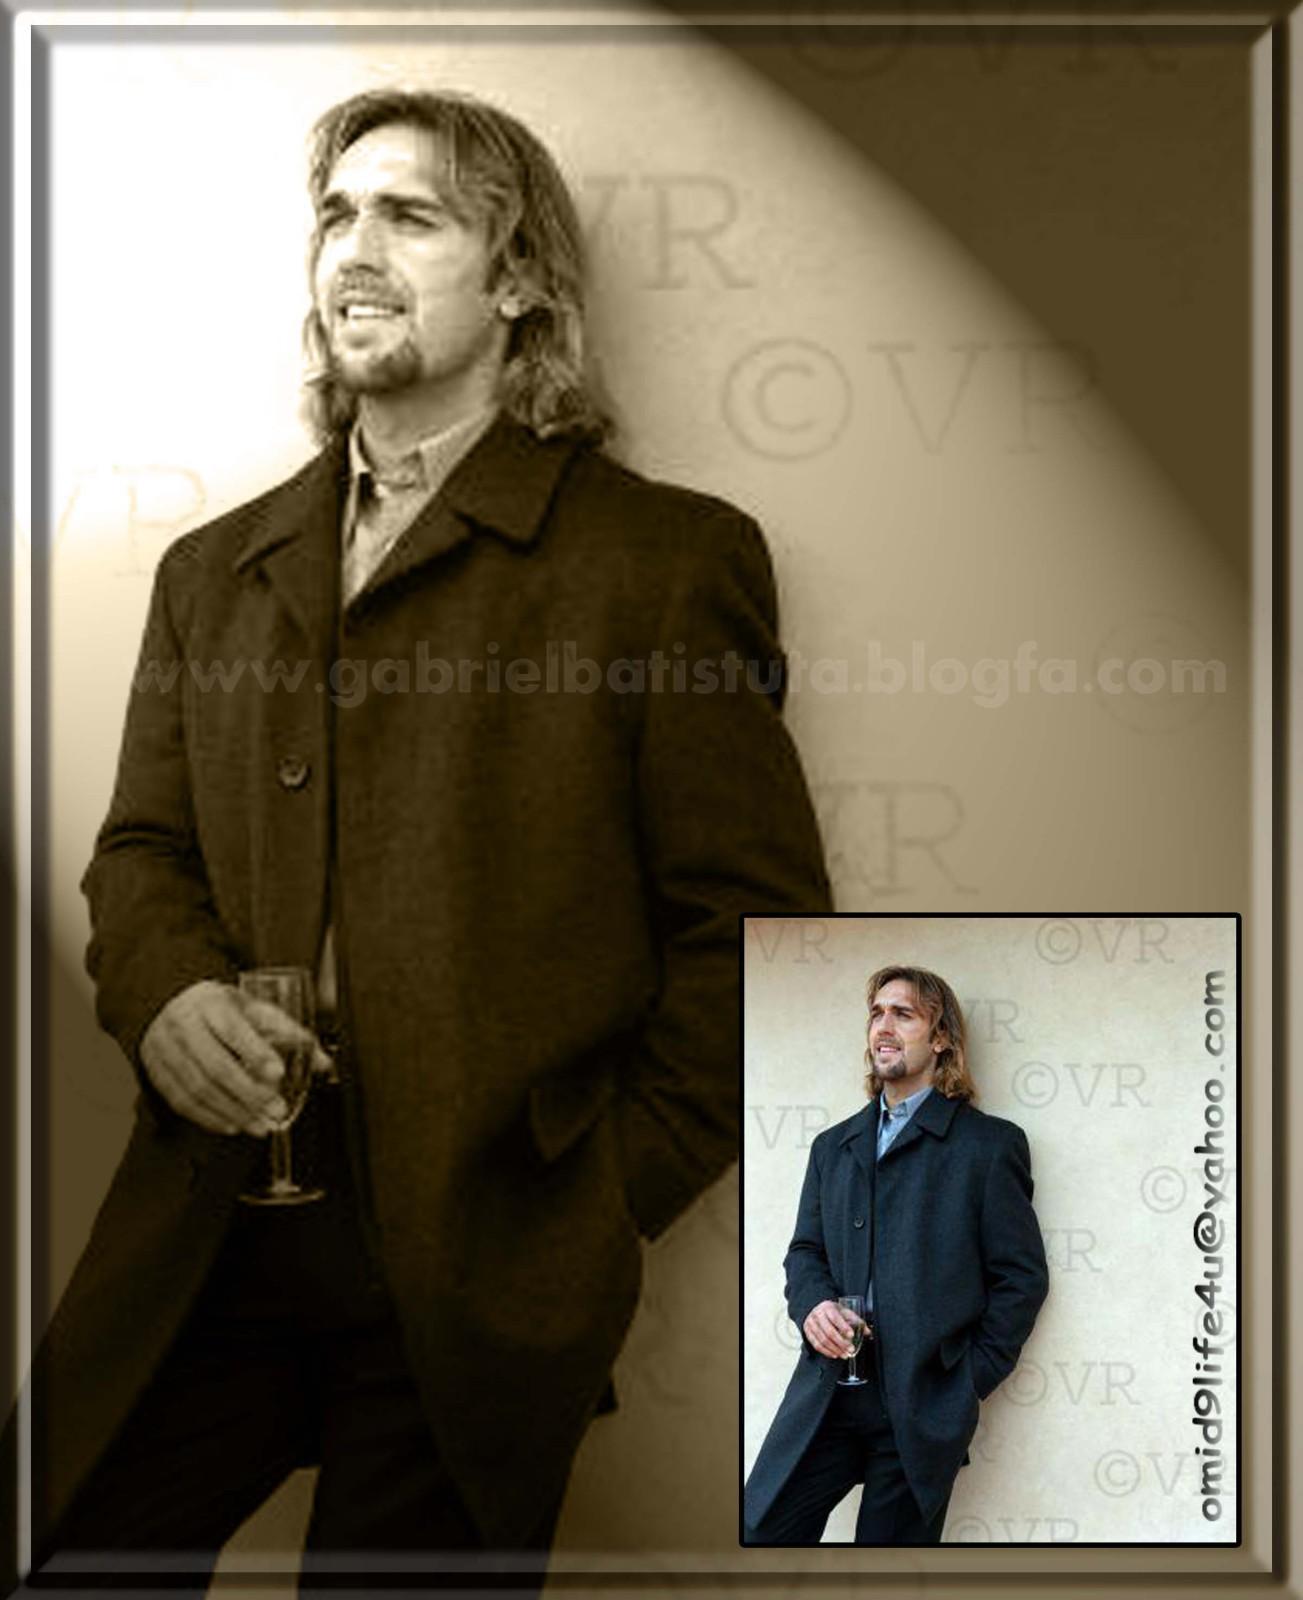 Index of varalbumsGabriel Omar Batistuta Wallpaper Gallery 1303x1600